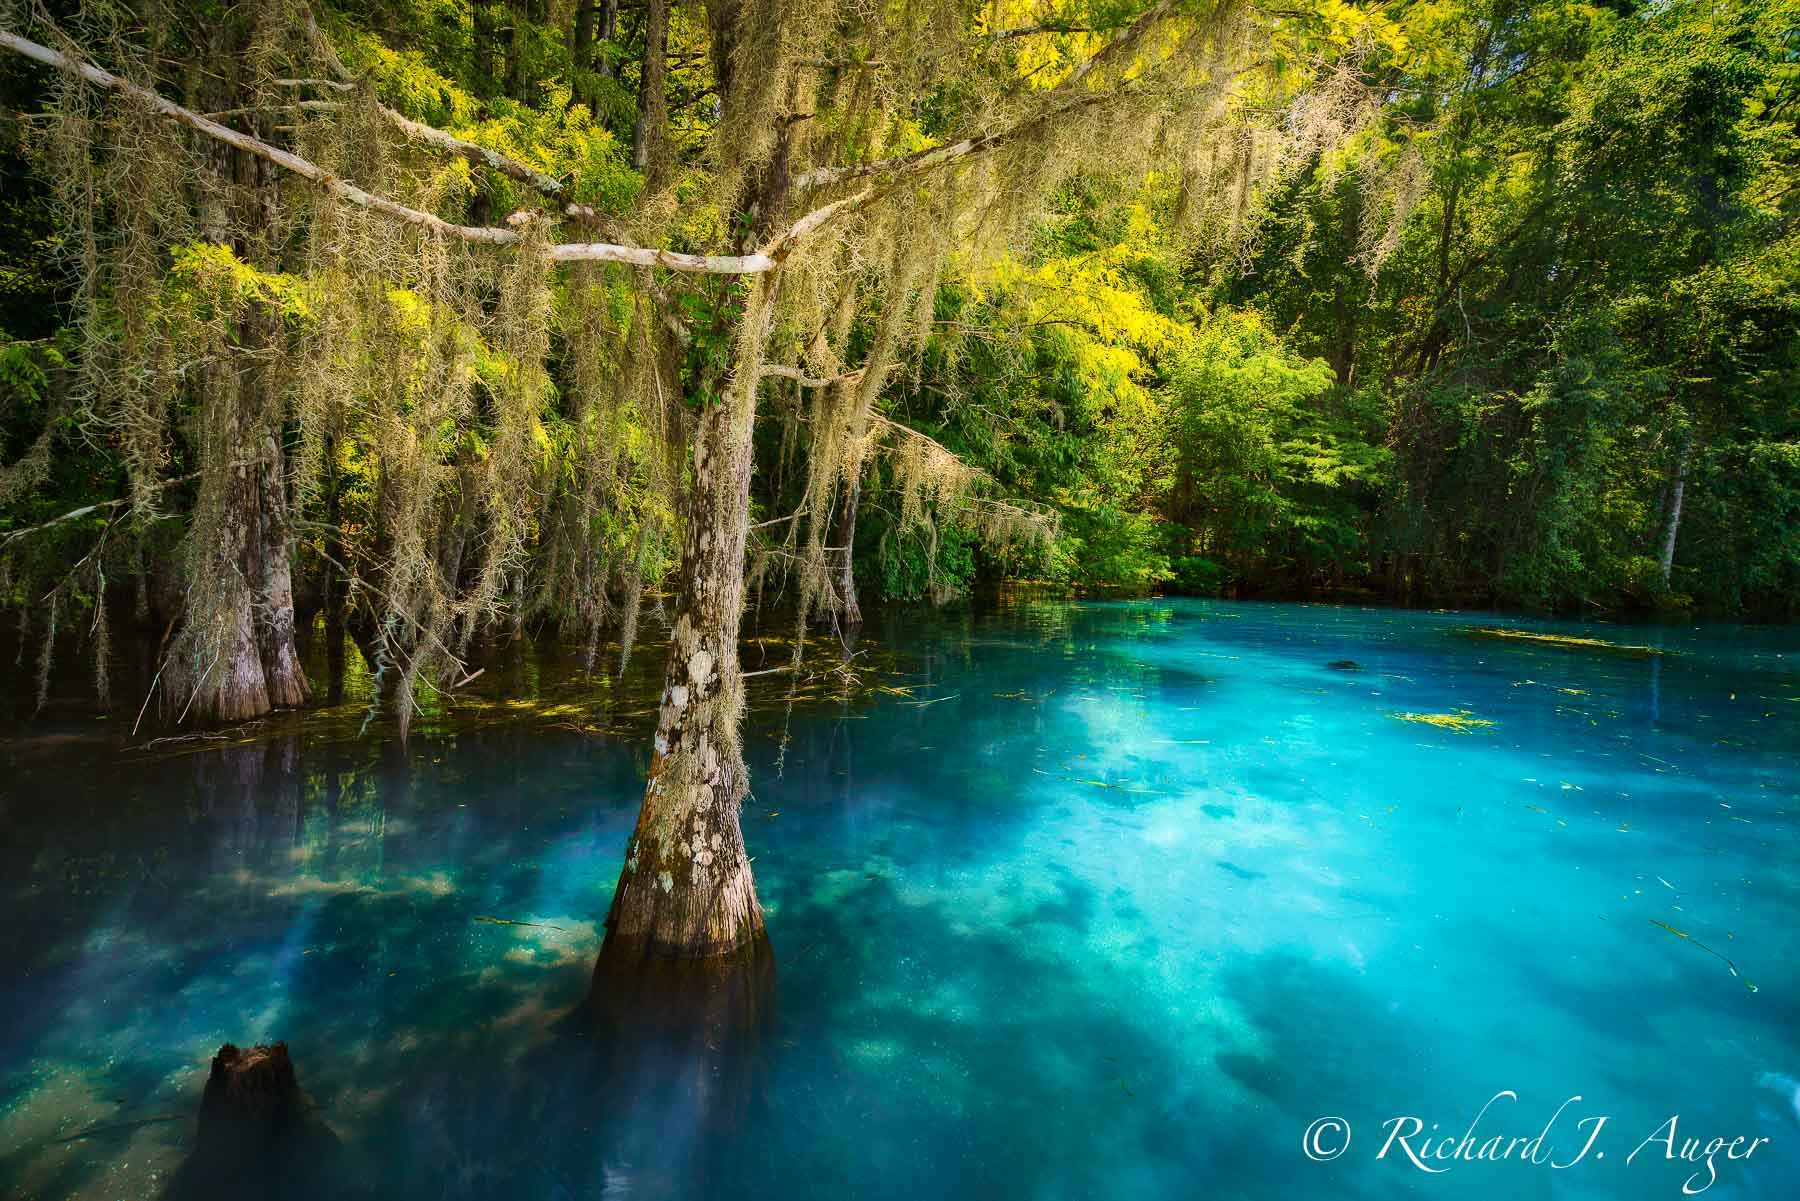 Shangri-La Spring, Florida, Cypress, Blue, Clear, Water, Photograph, Landscape, Sunshine